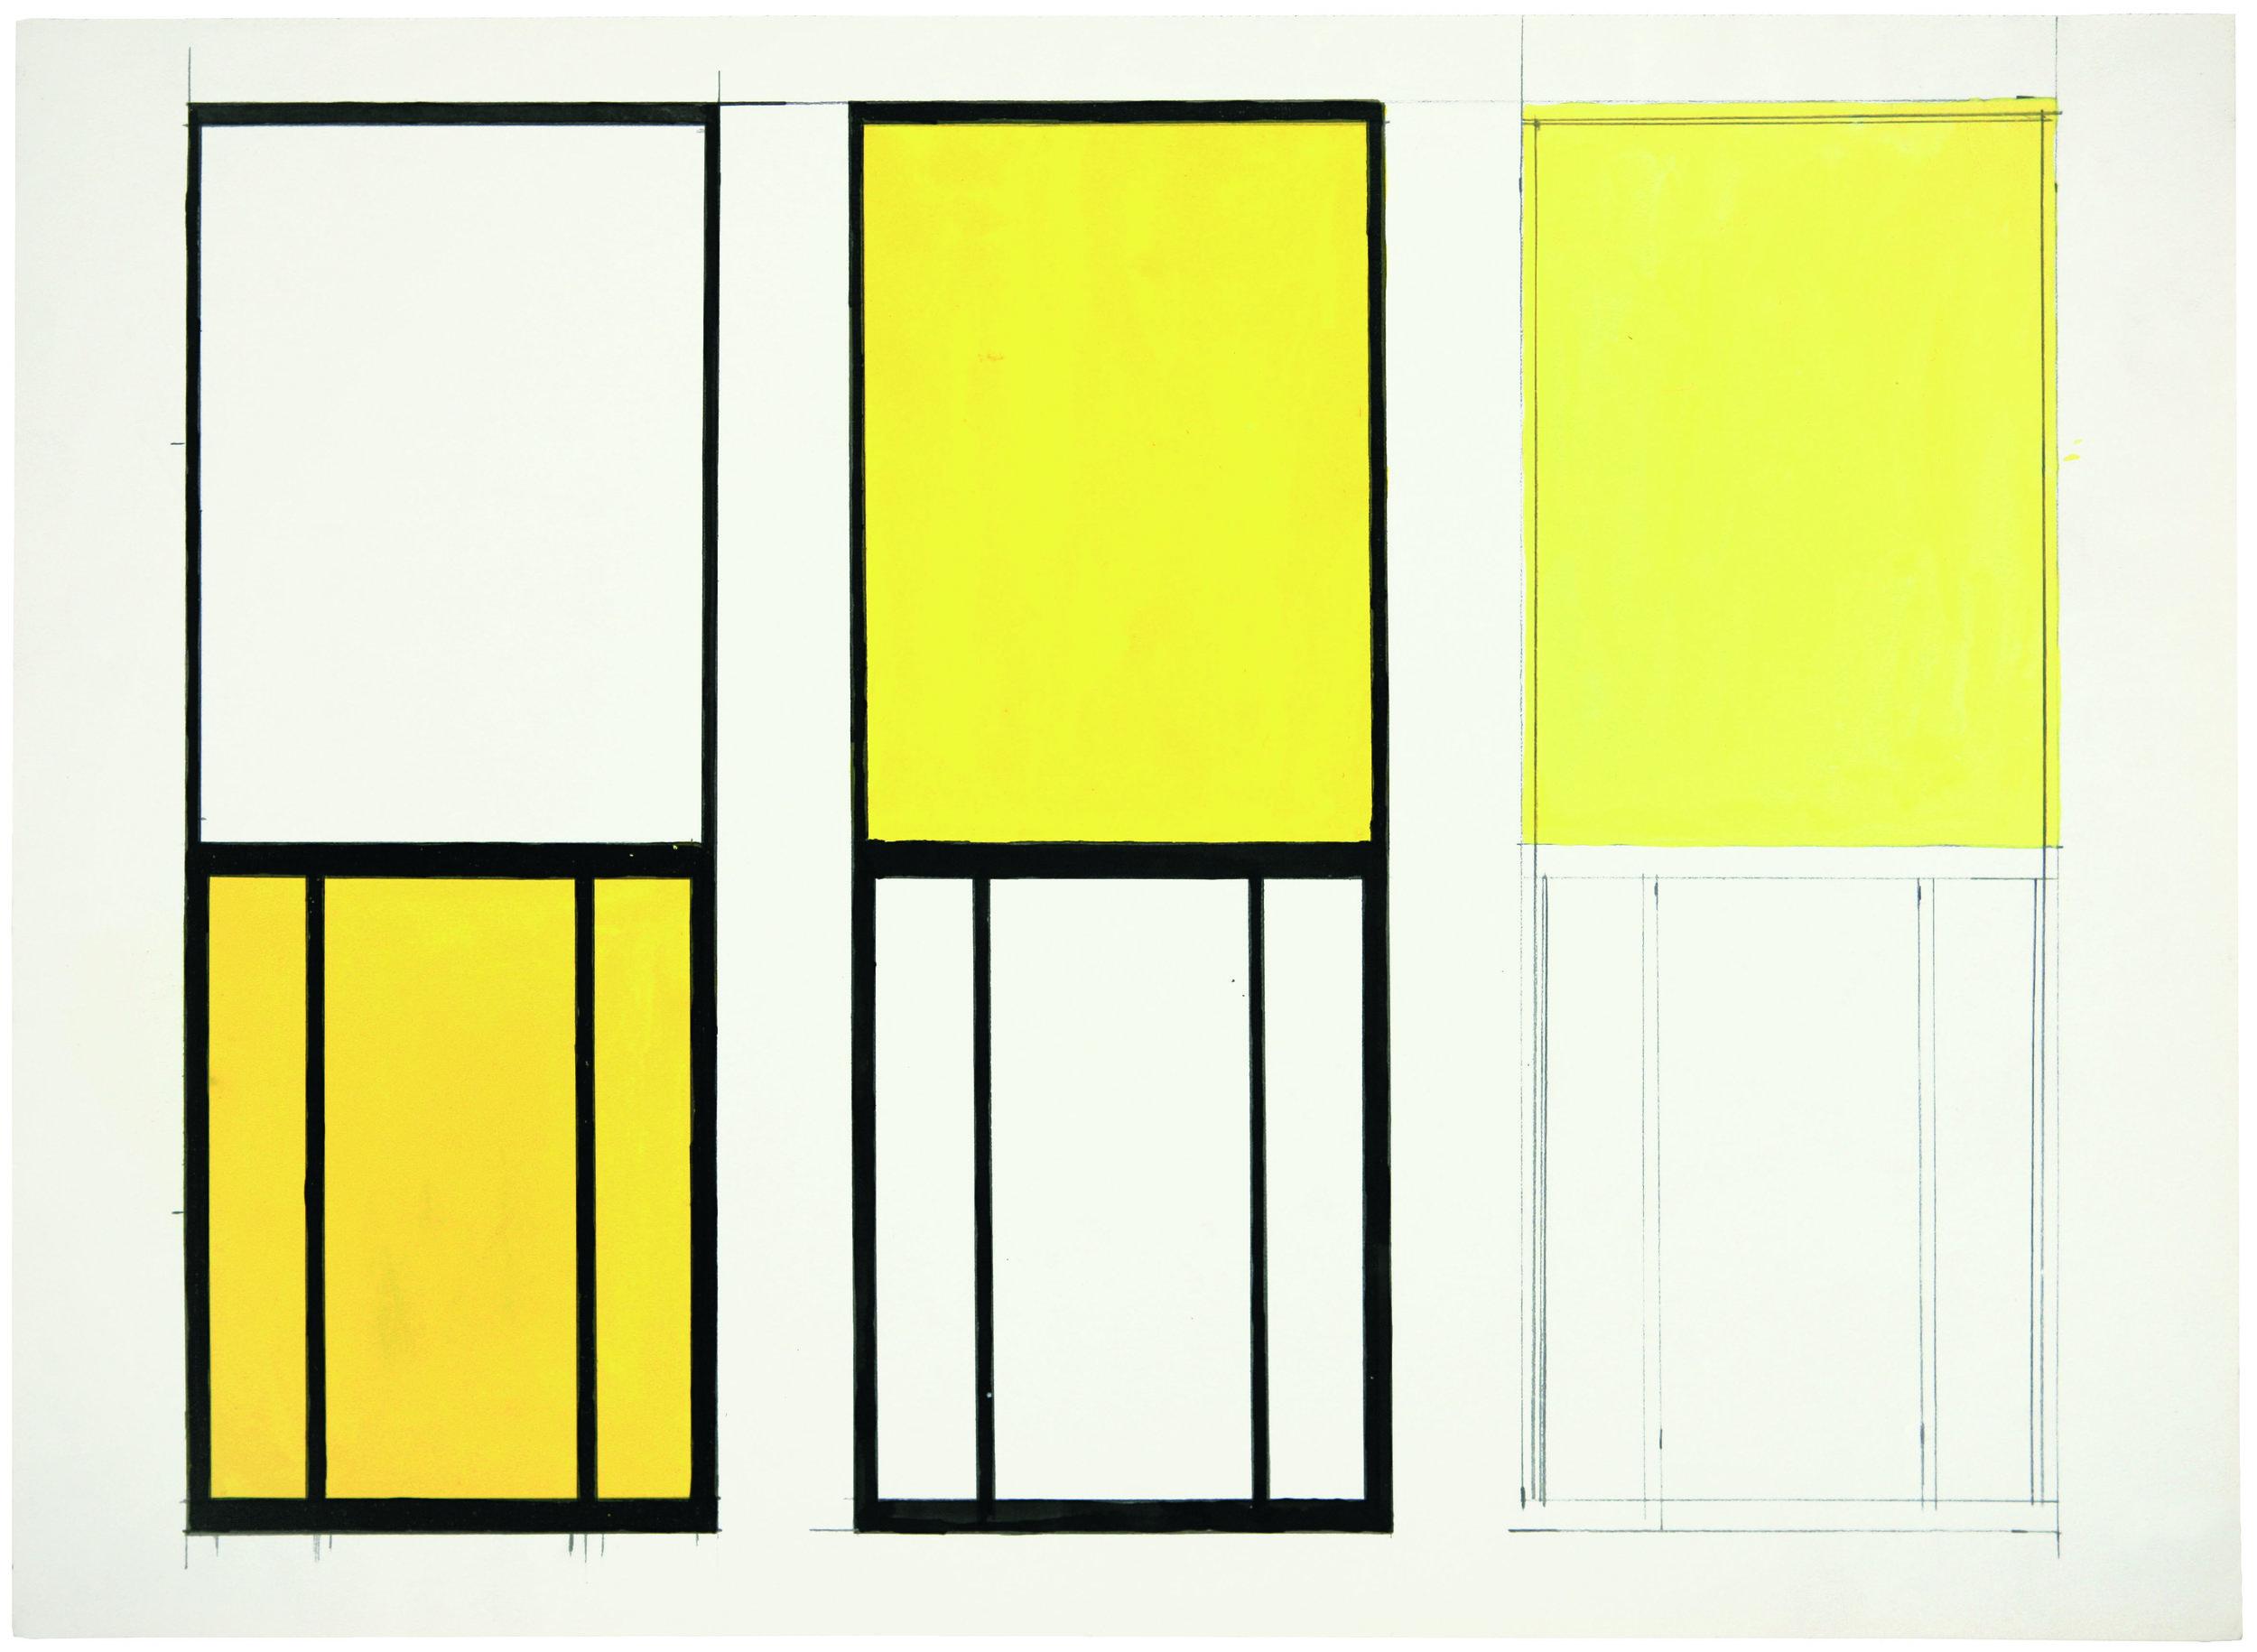 Study for Window, Museum of Modern Art, Paris - Ellsworth Kelly